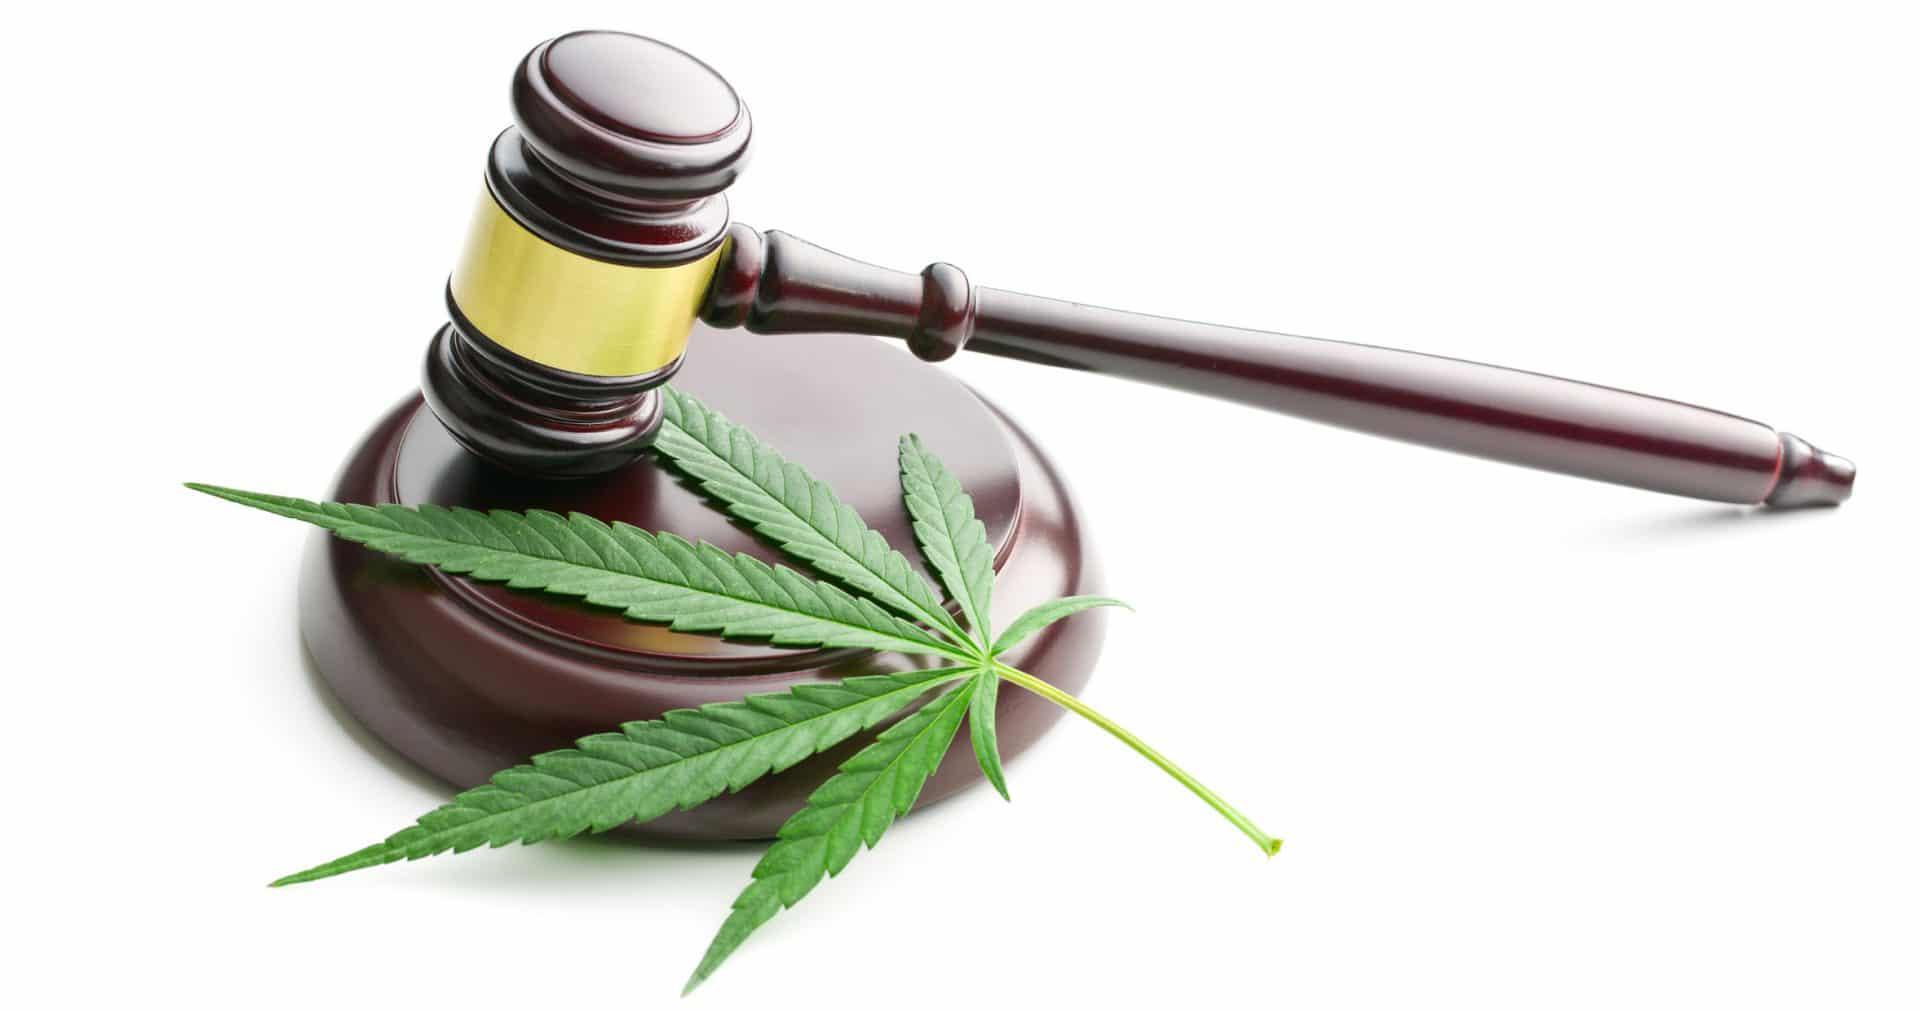 Legge sulla cannabis